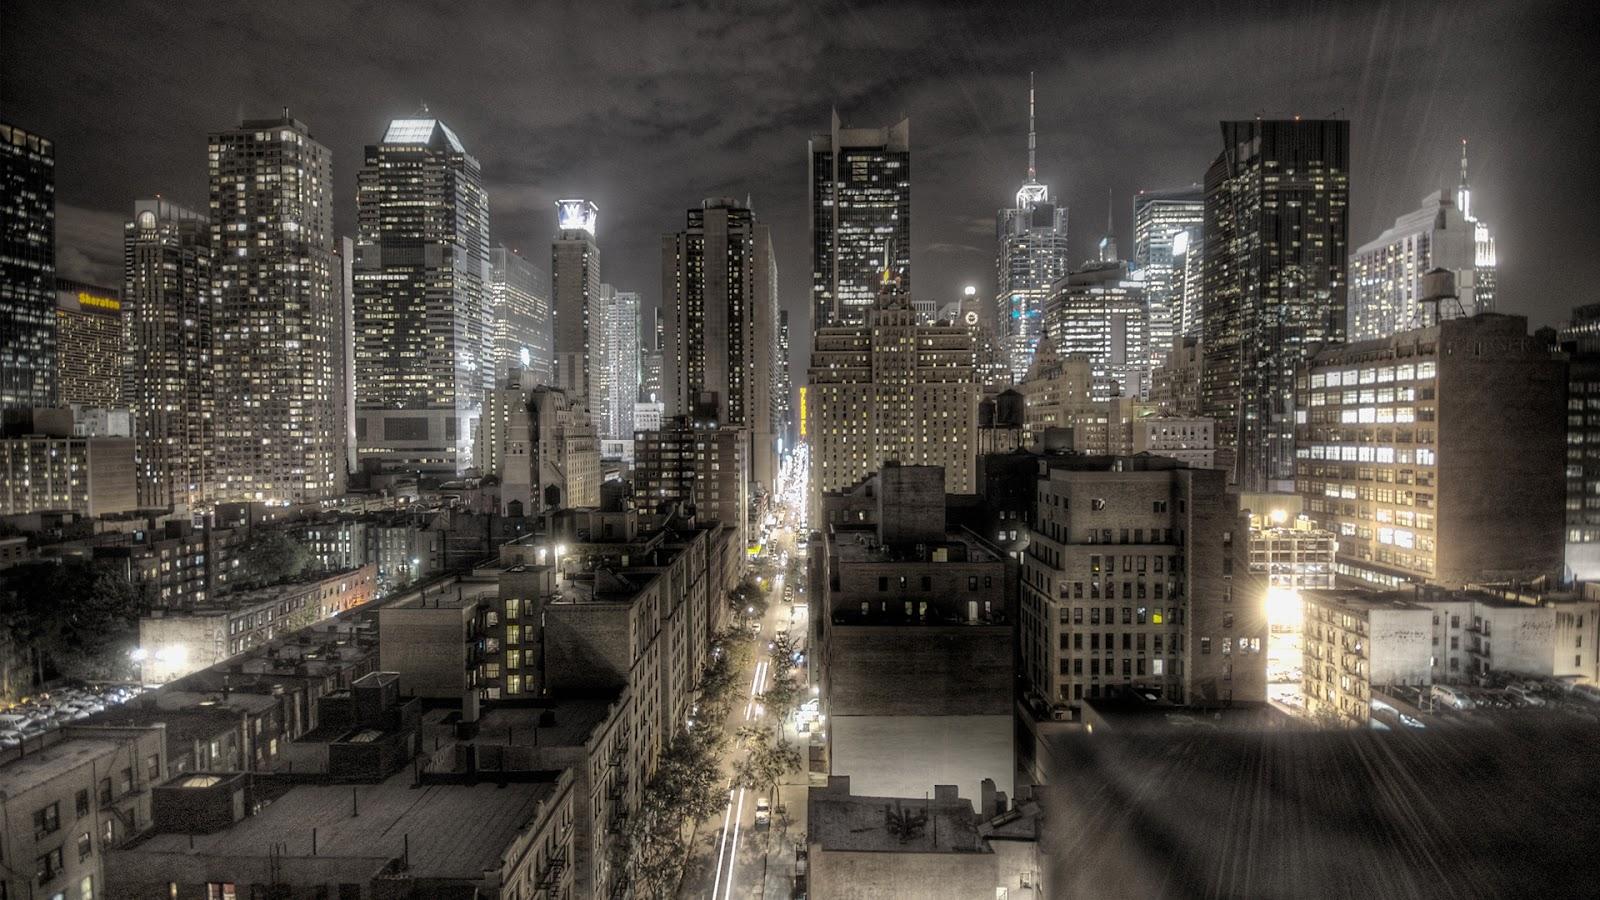 city at night live wallpaper 1600x900